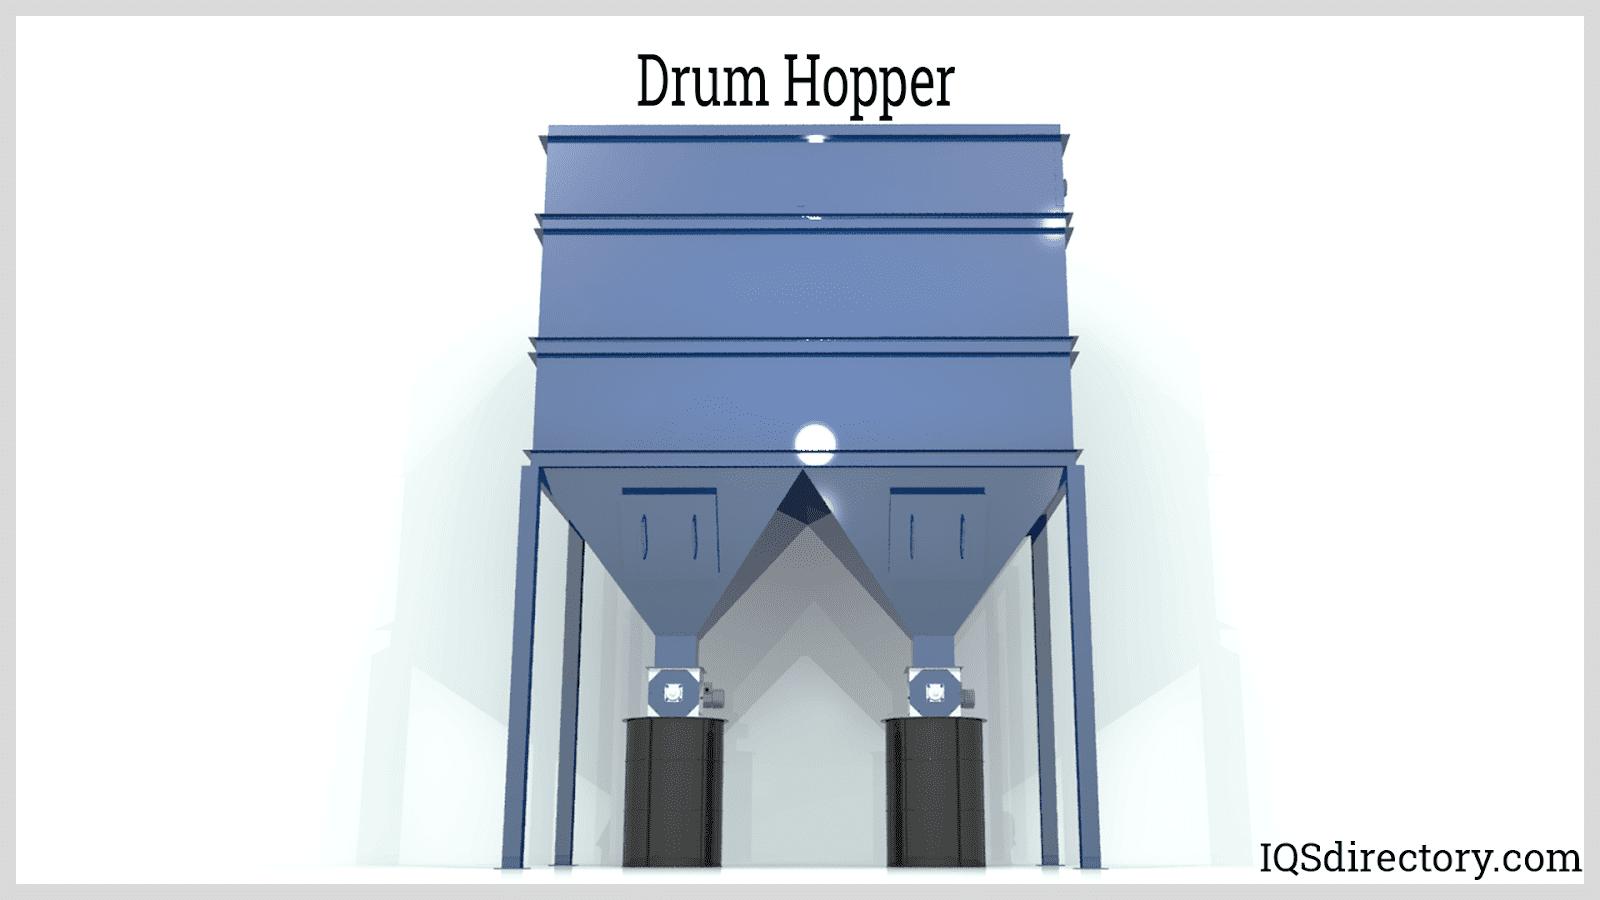 Drum Hopper